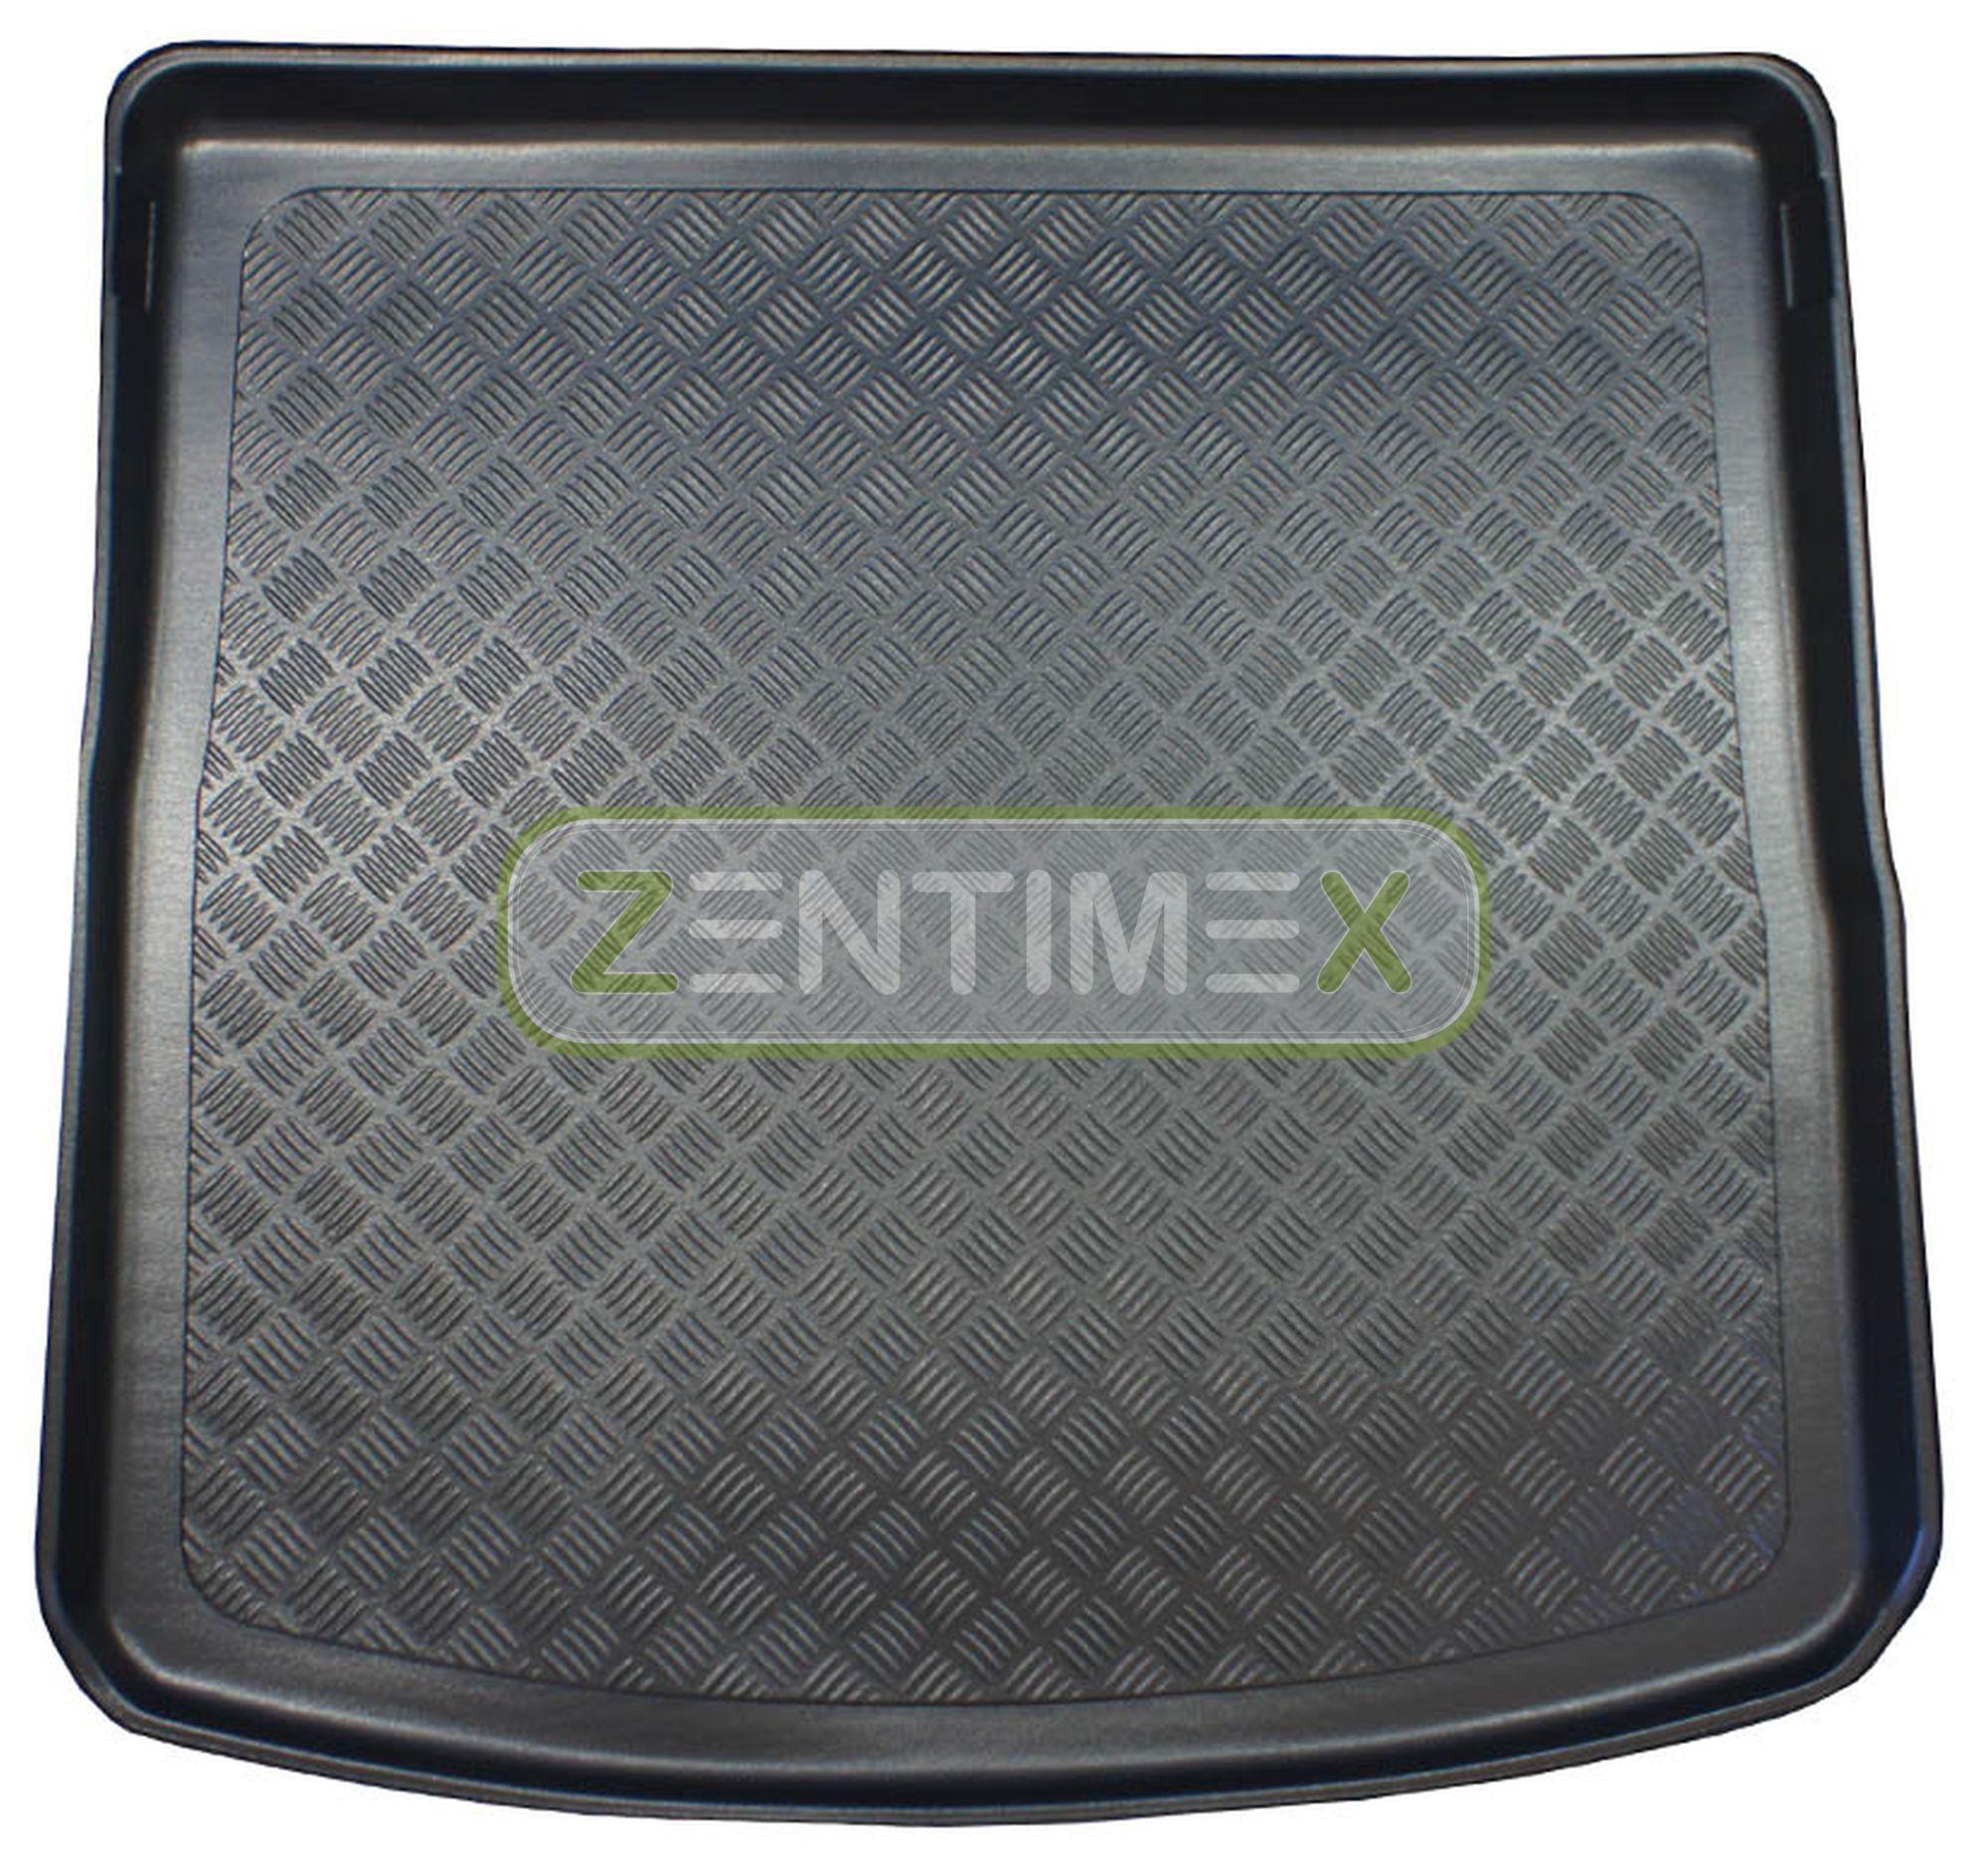 geriffelte kofferraumwanne f r seat leon st fr 3 5f kombi. Black Bedroom Furniture Sets. Home Design Ideas